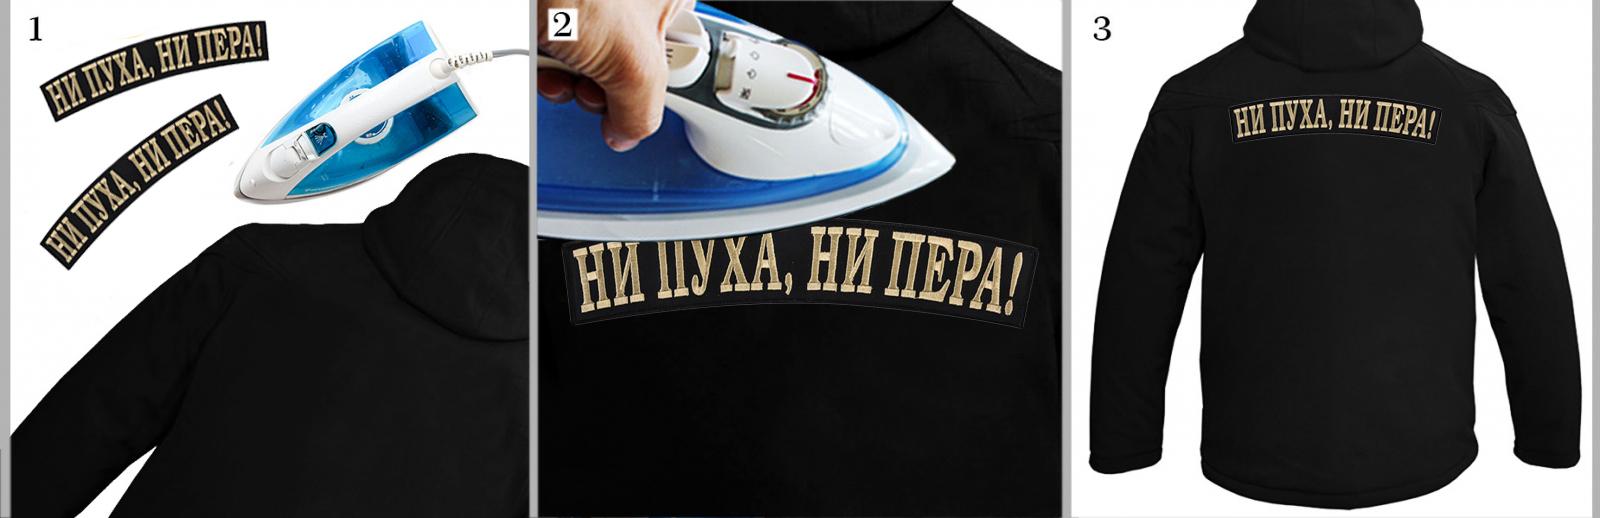 Купить на сайте Военпро термоклеевой шеврон ОХОТА